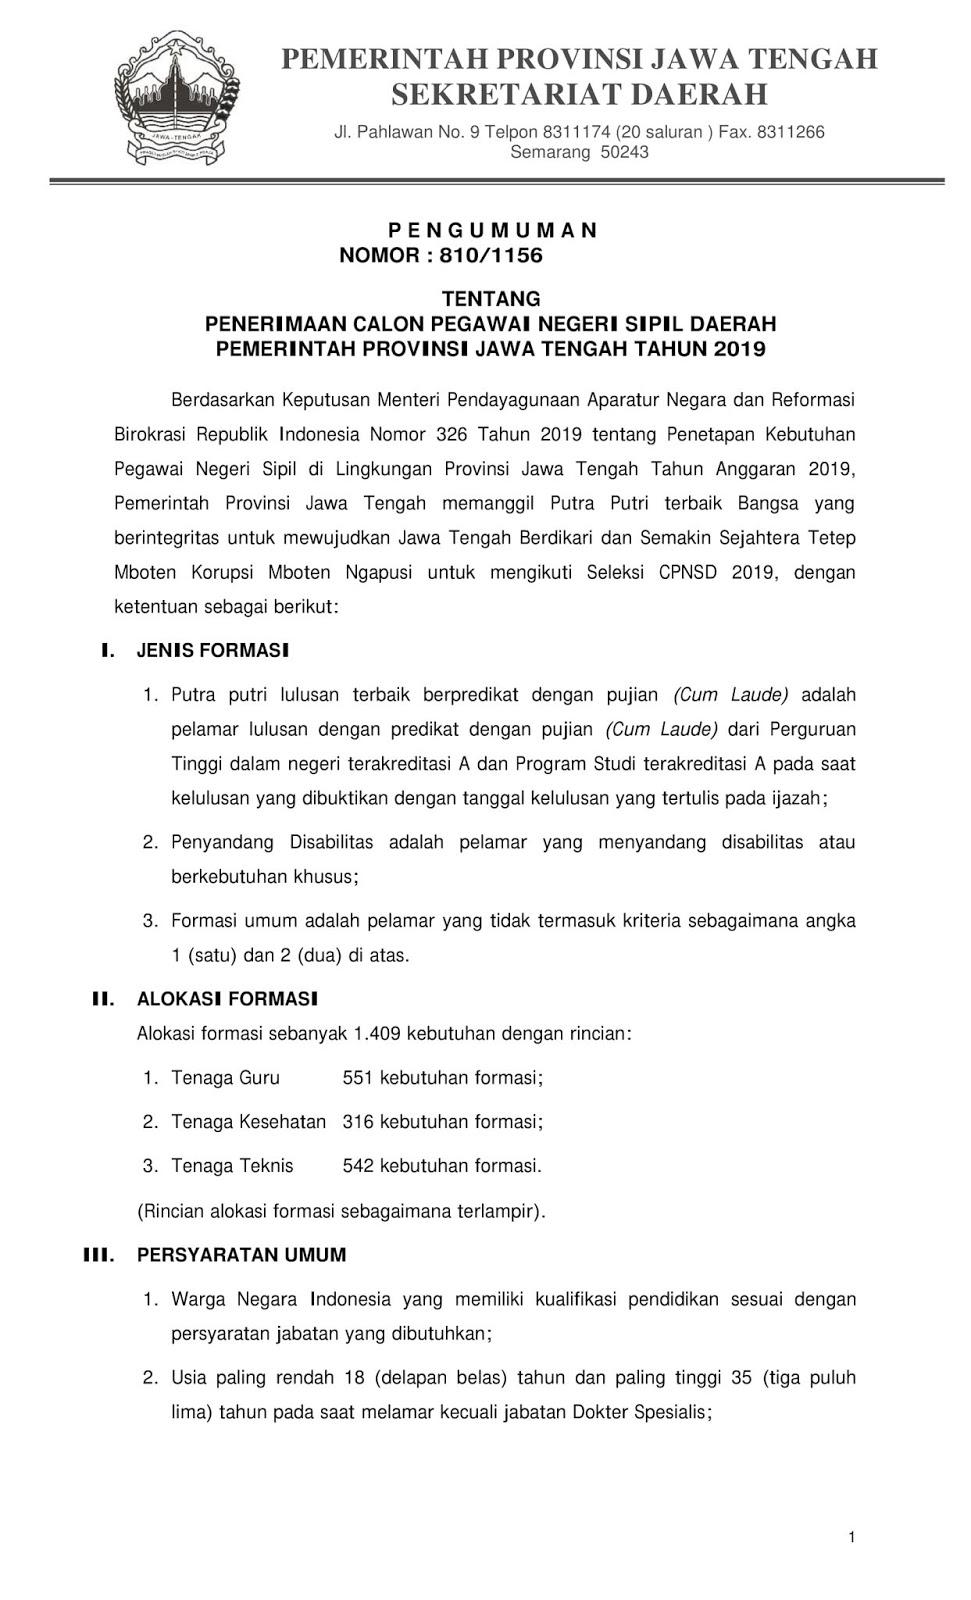 Lowongan CPNS Provinsi Jawa Tengah Tahun Anggaran 2019 [1.409 Formasi]